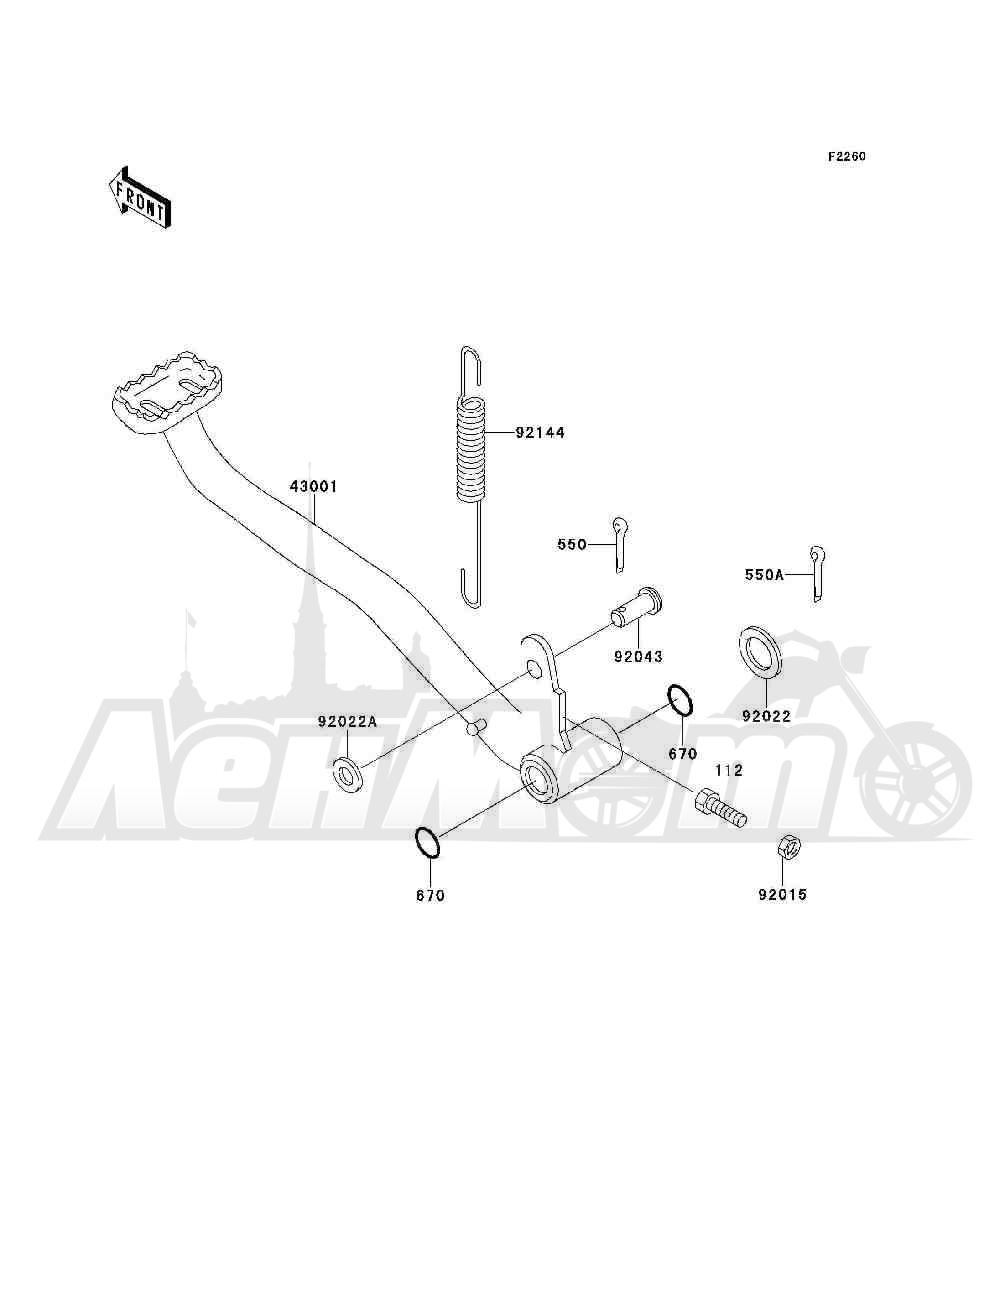 Запчасти для Квадроцикла Kawasaki 1993 BAYOU 300 4X4 (KLF300-C5) Раздел: BRAKE PEDAL | педаль тормоза